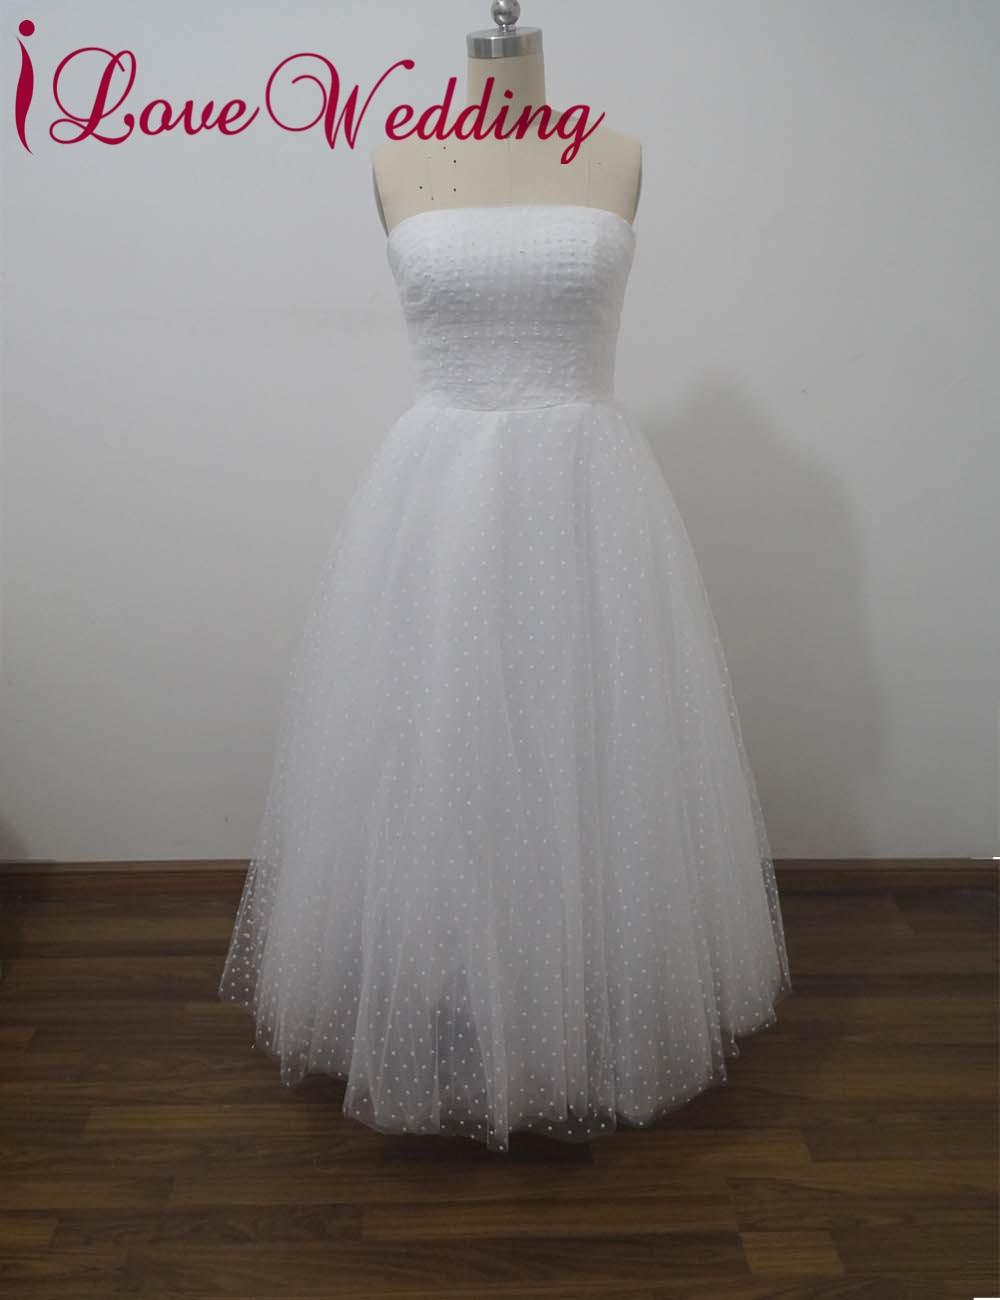 iLoveWedding Vintage Polka Dotted Wedding Dresses Formal Tulle Strapless Zipper Ankle Length Bridal Gowns Custom WE12